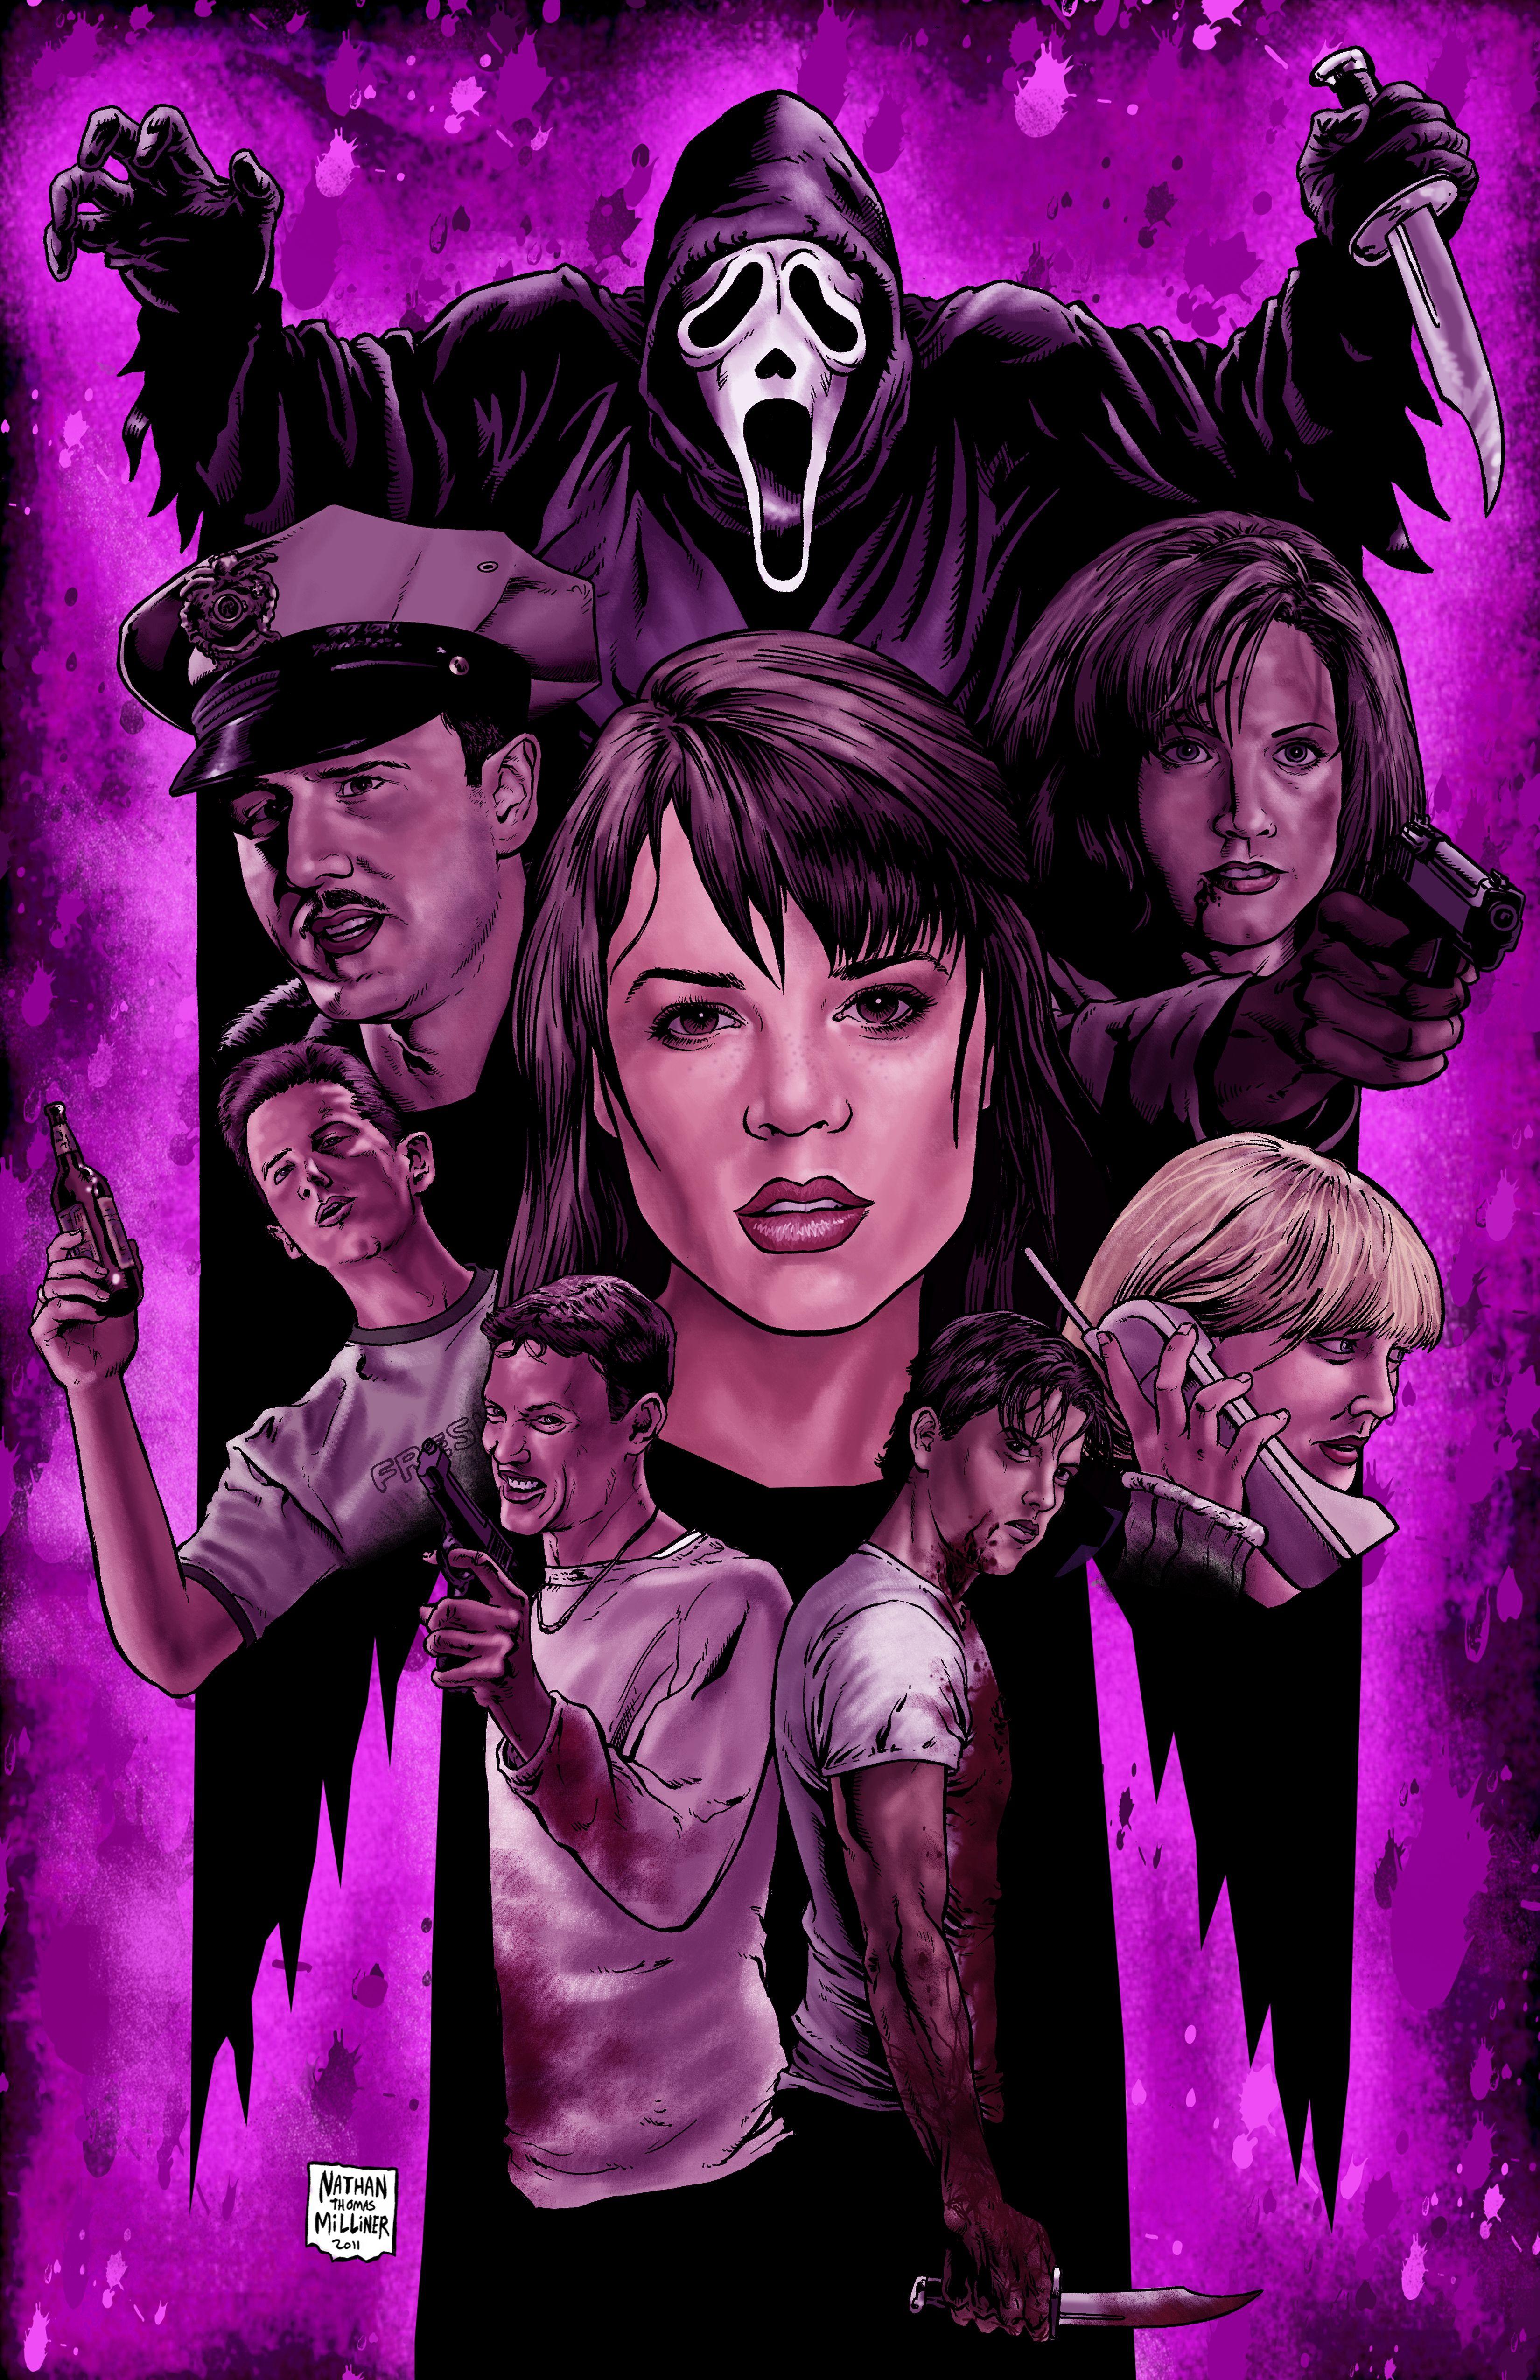 Pin by lan vo on 04 April 2018 Horror movie art, Scream